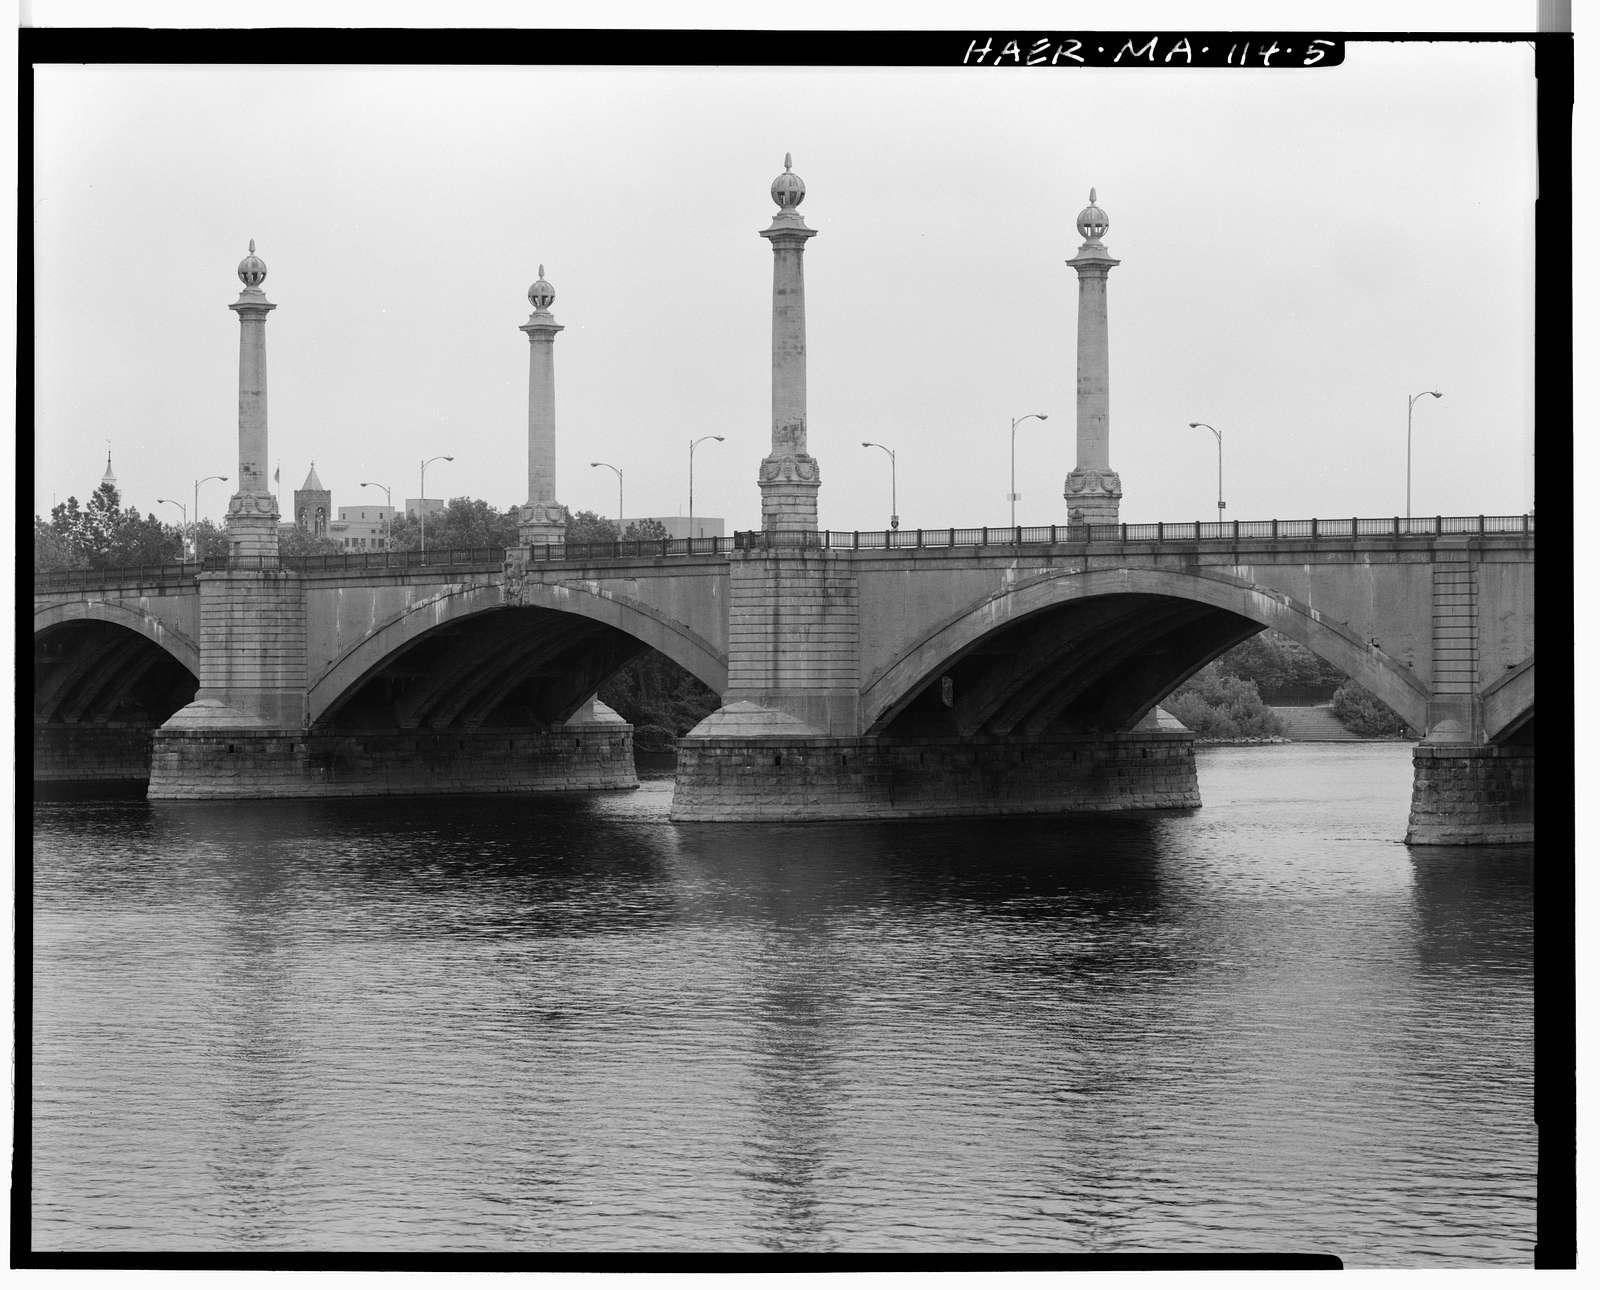 Hampden County Memorial Bridge, Spanning Connecticut River on Memorial Drive, Springfield, Hampden County, MA